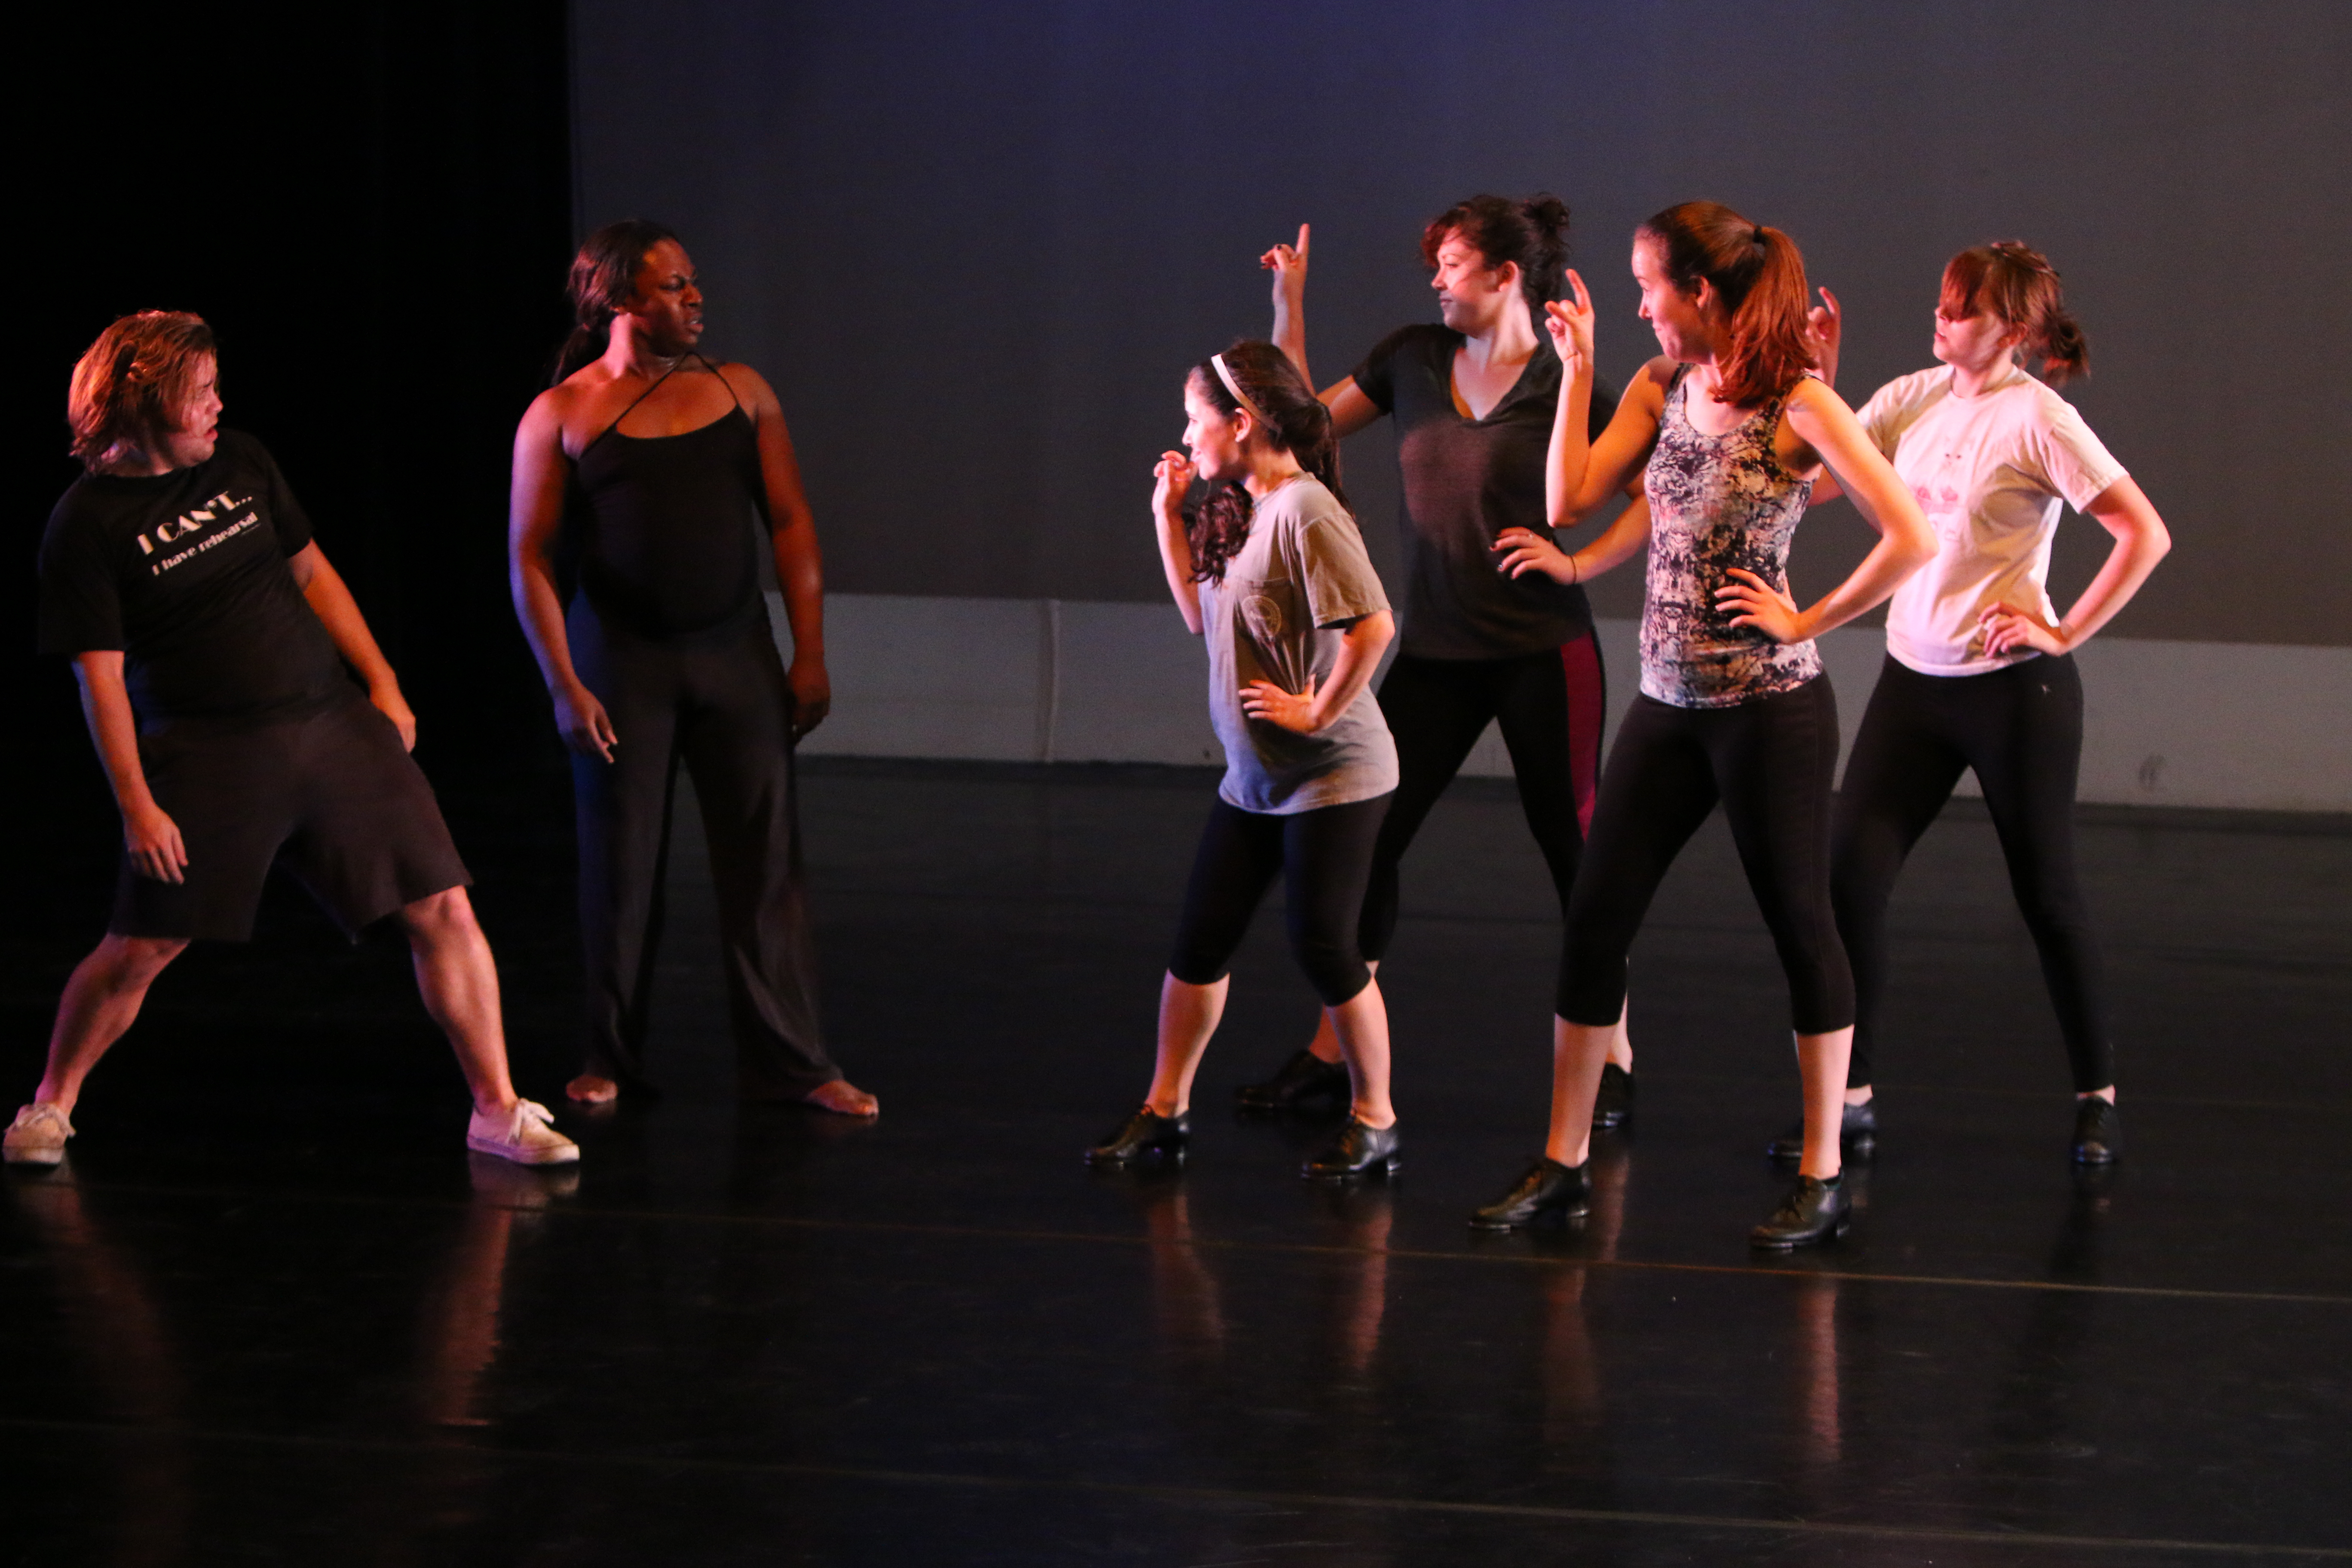 Dallas-born dancer, New York performer brings versatility, teaches tap, modern, jazz